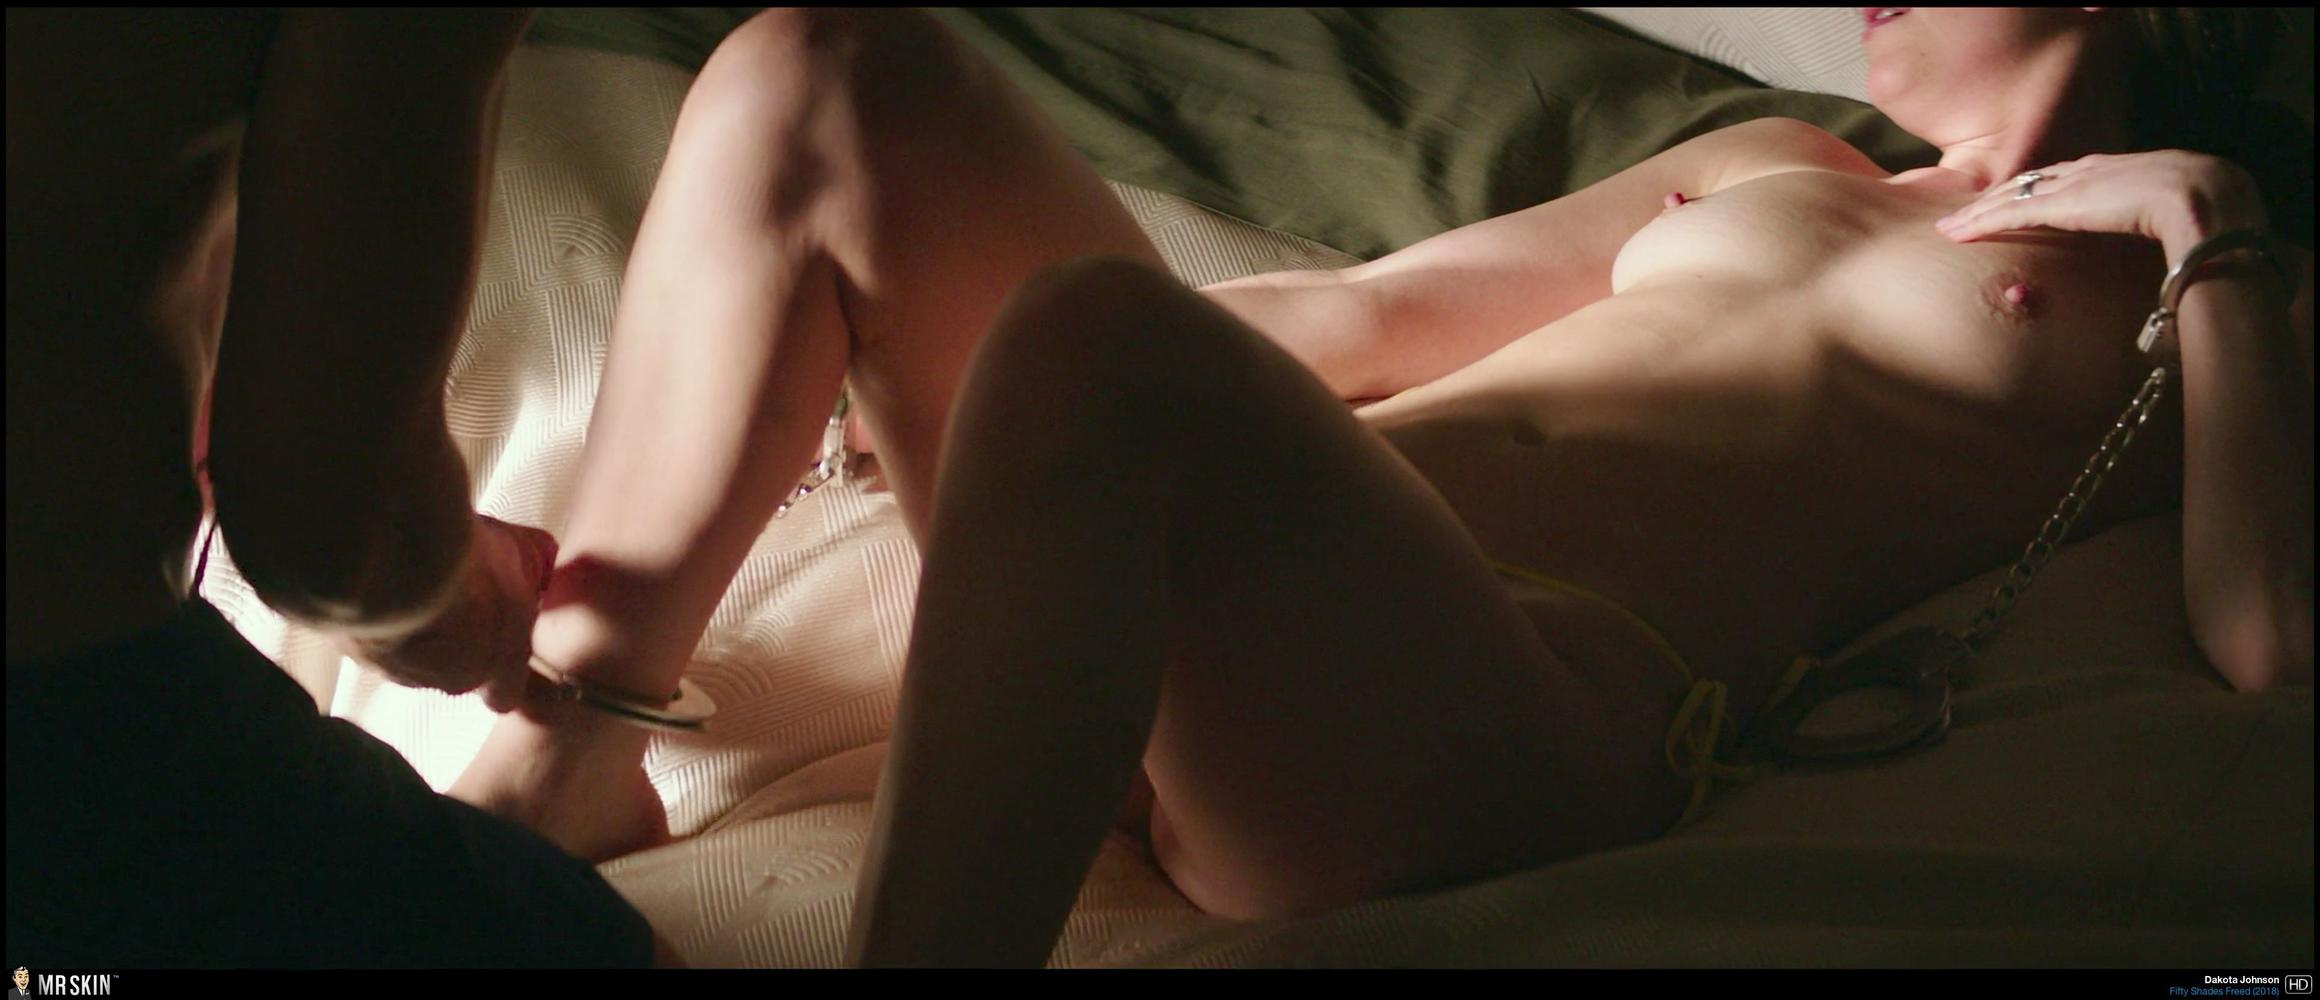 Battle Of The Babes Dakota Johnson Vs Emilia Clarke-7444